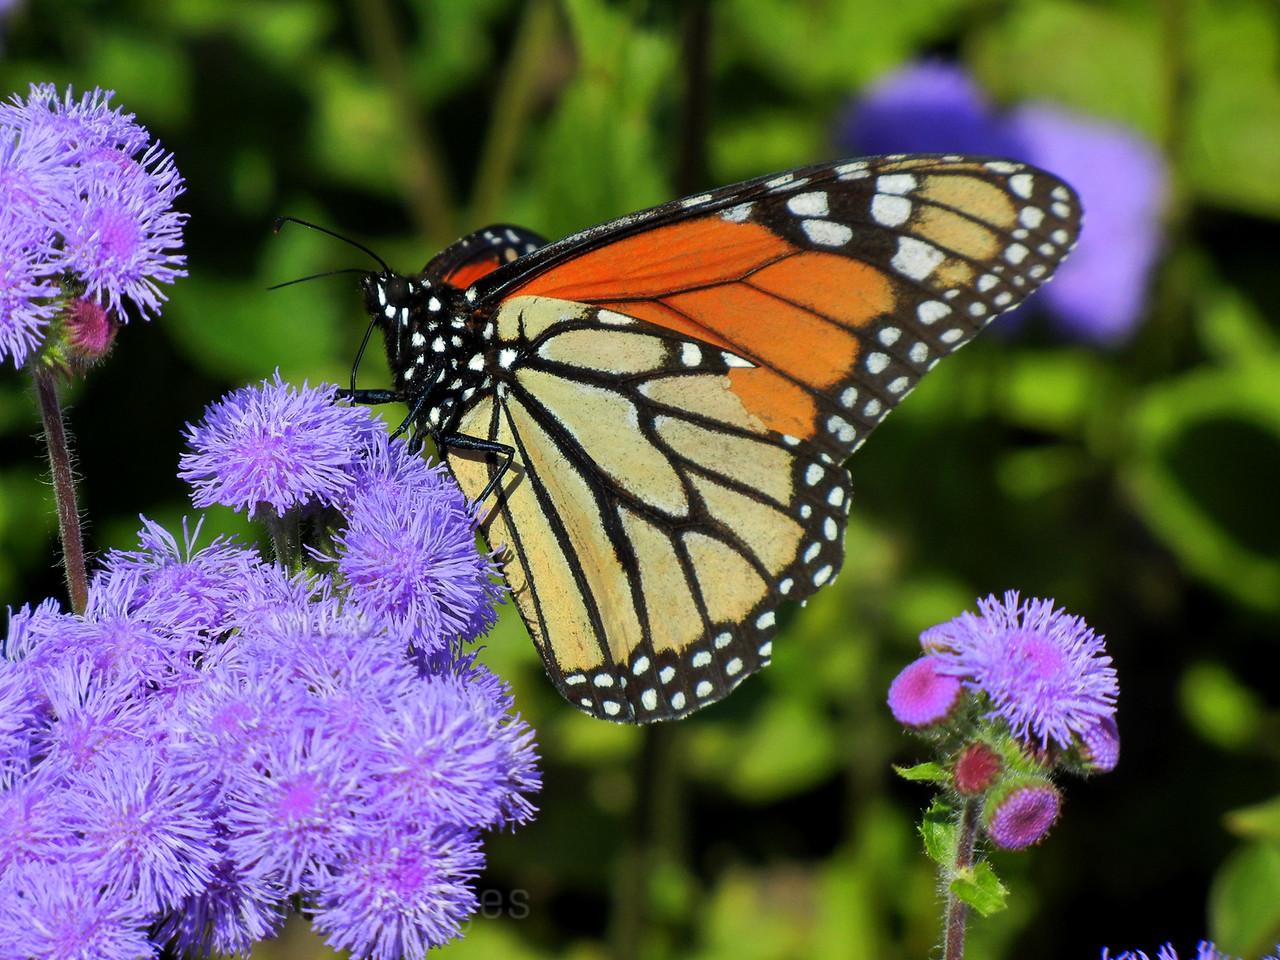 A Butterfly Imbibing Nectar From Garden Flowers